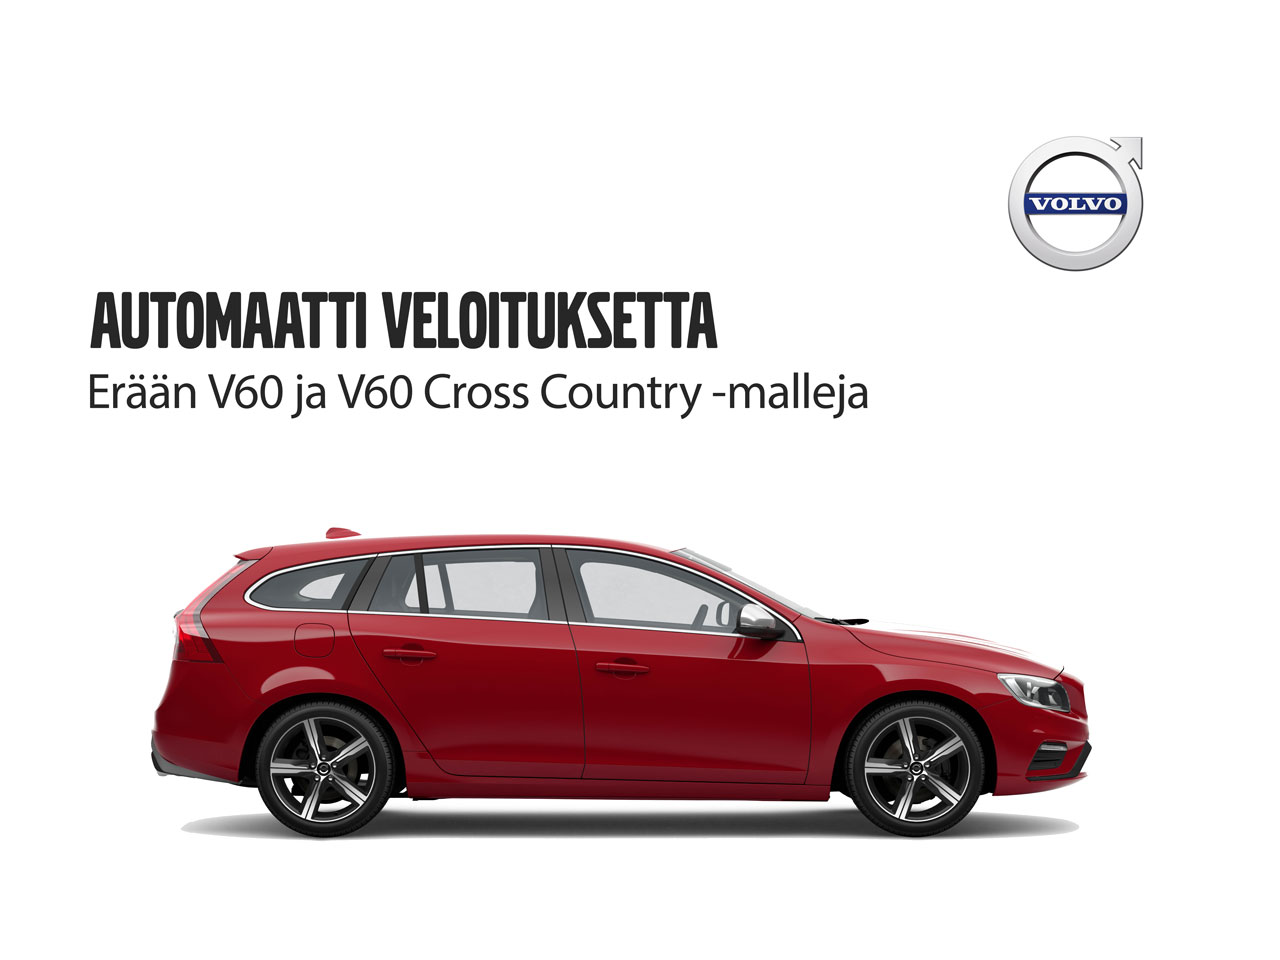 Volvo V60: automaatti veloituksetta